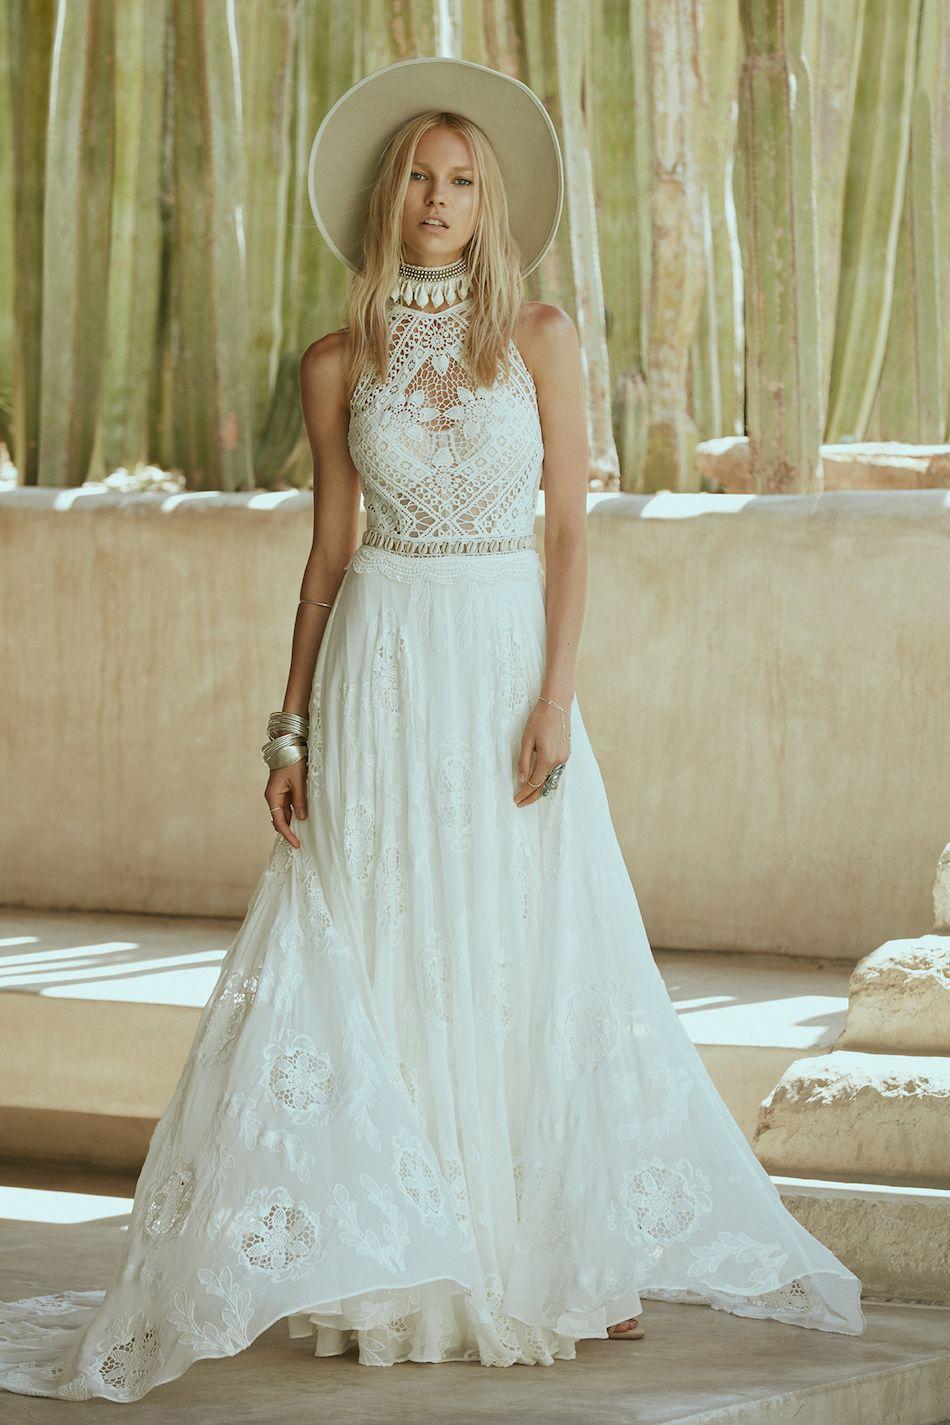 Amazing Vestidos Novia Hippie Chic Contemporary - Wedding Ideas ...